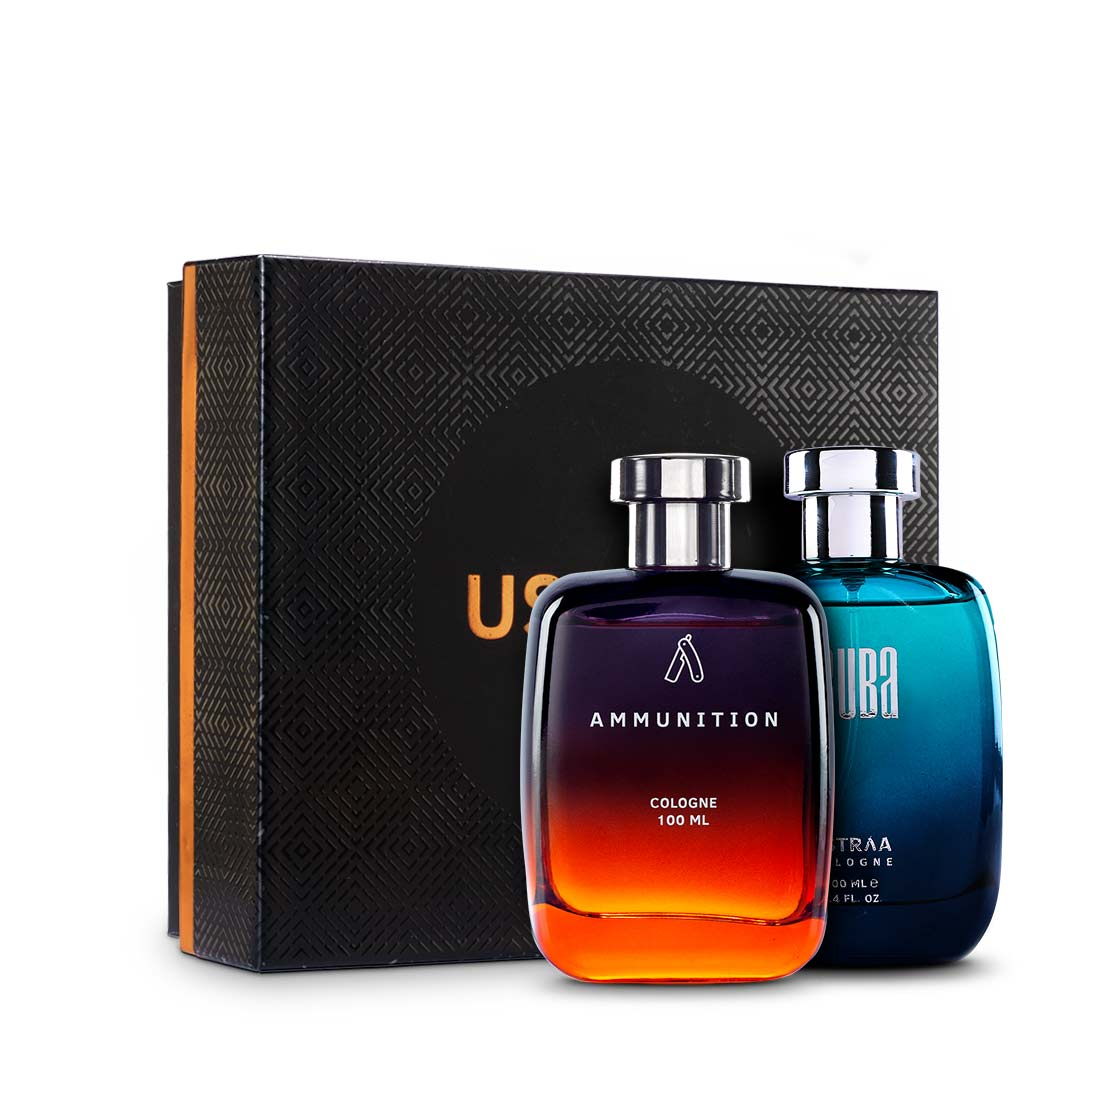 Ustraa | Fragrance Gift Box - Scuba Cologne 100ml & Ammunition Cologne 100ml